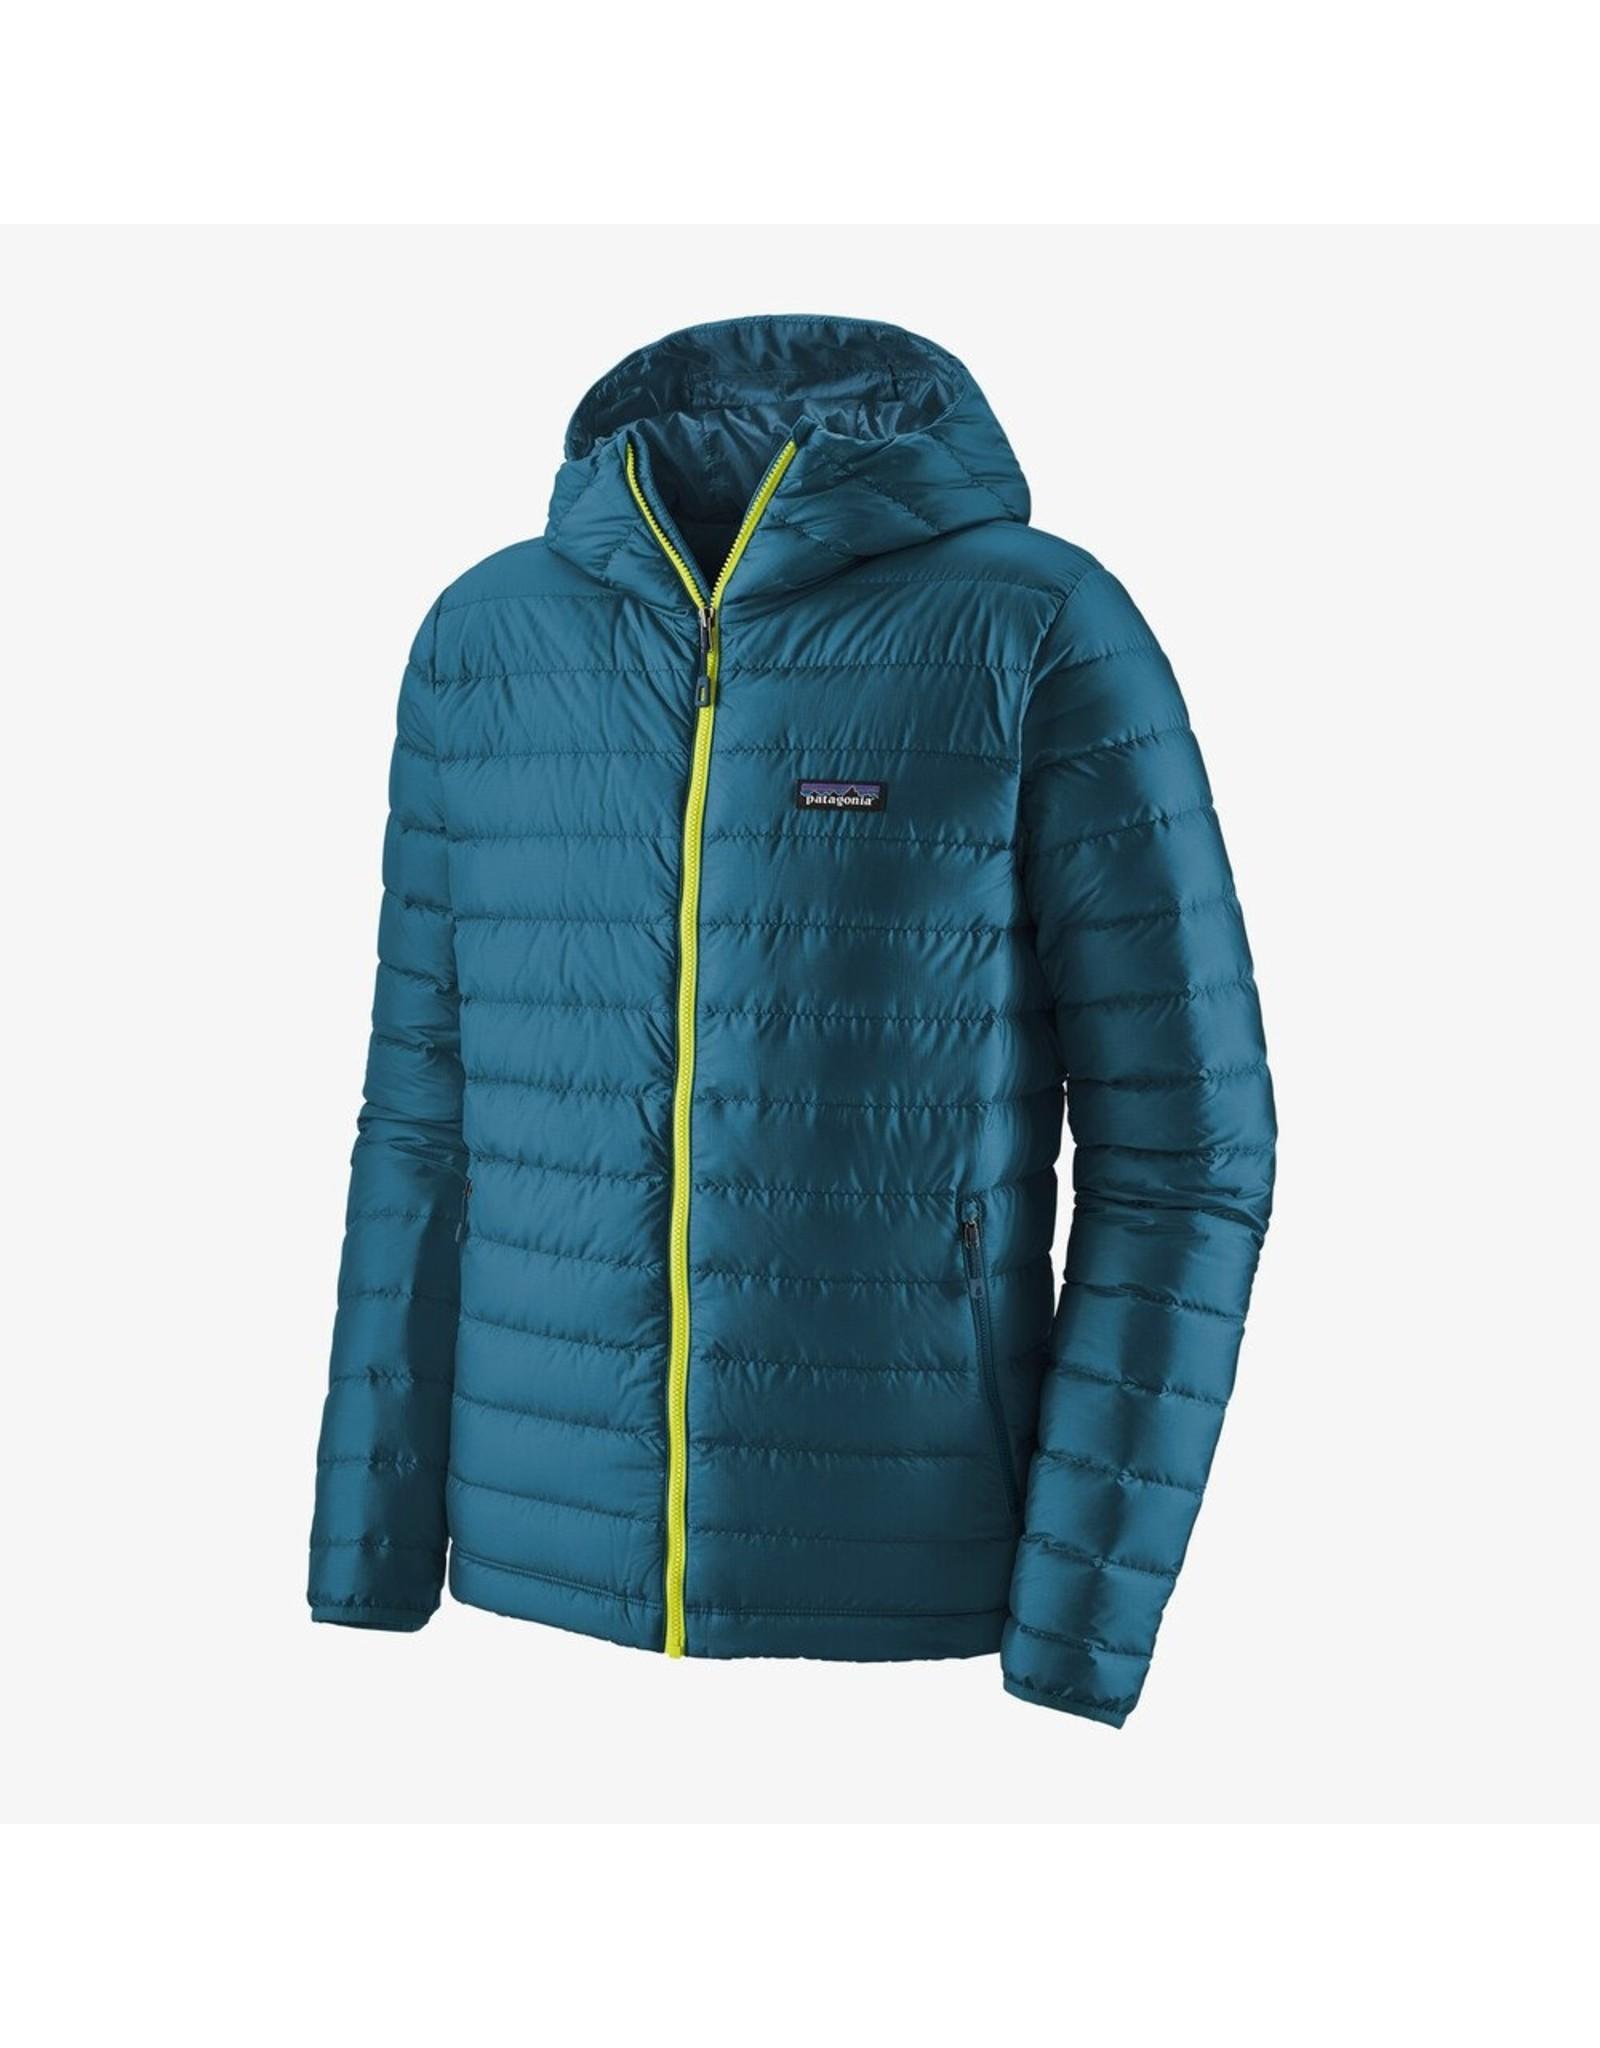 Patagonia Patagonia - Men's Down Sweater Hoody